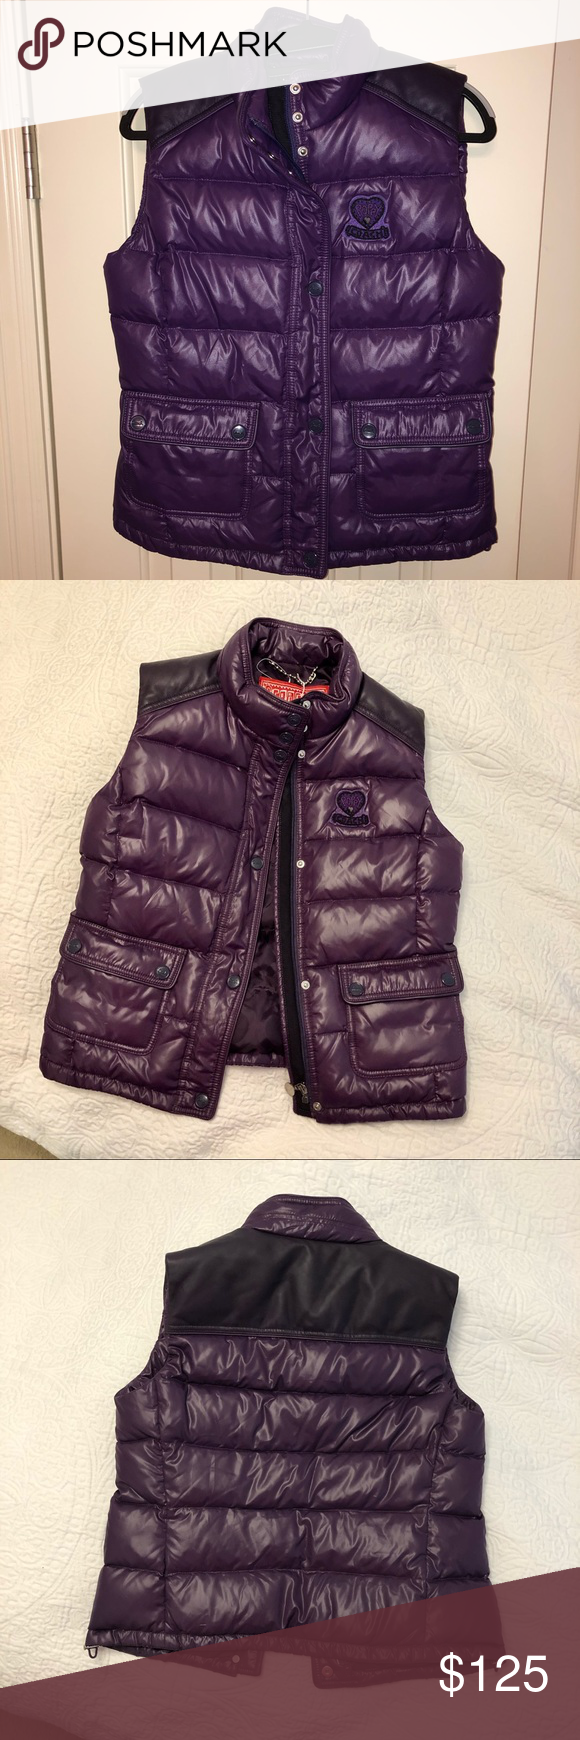 New Coach Puffer vest jacket size medium in 2020 Vest